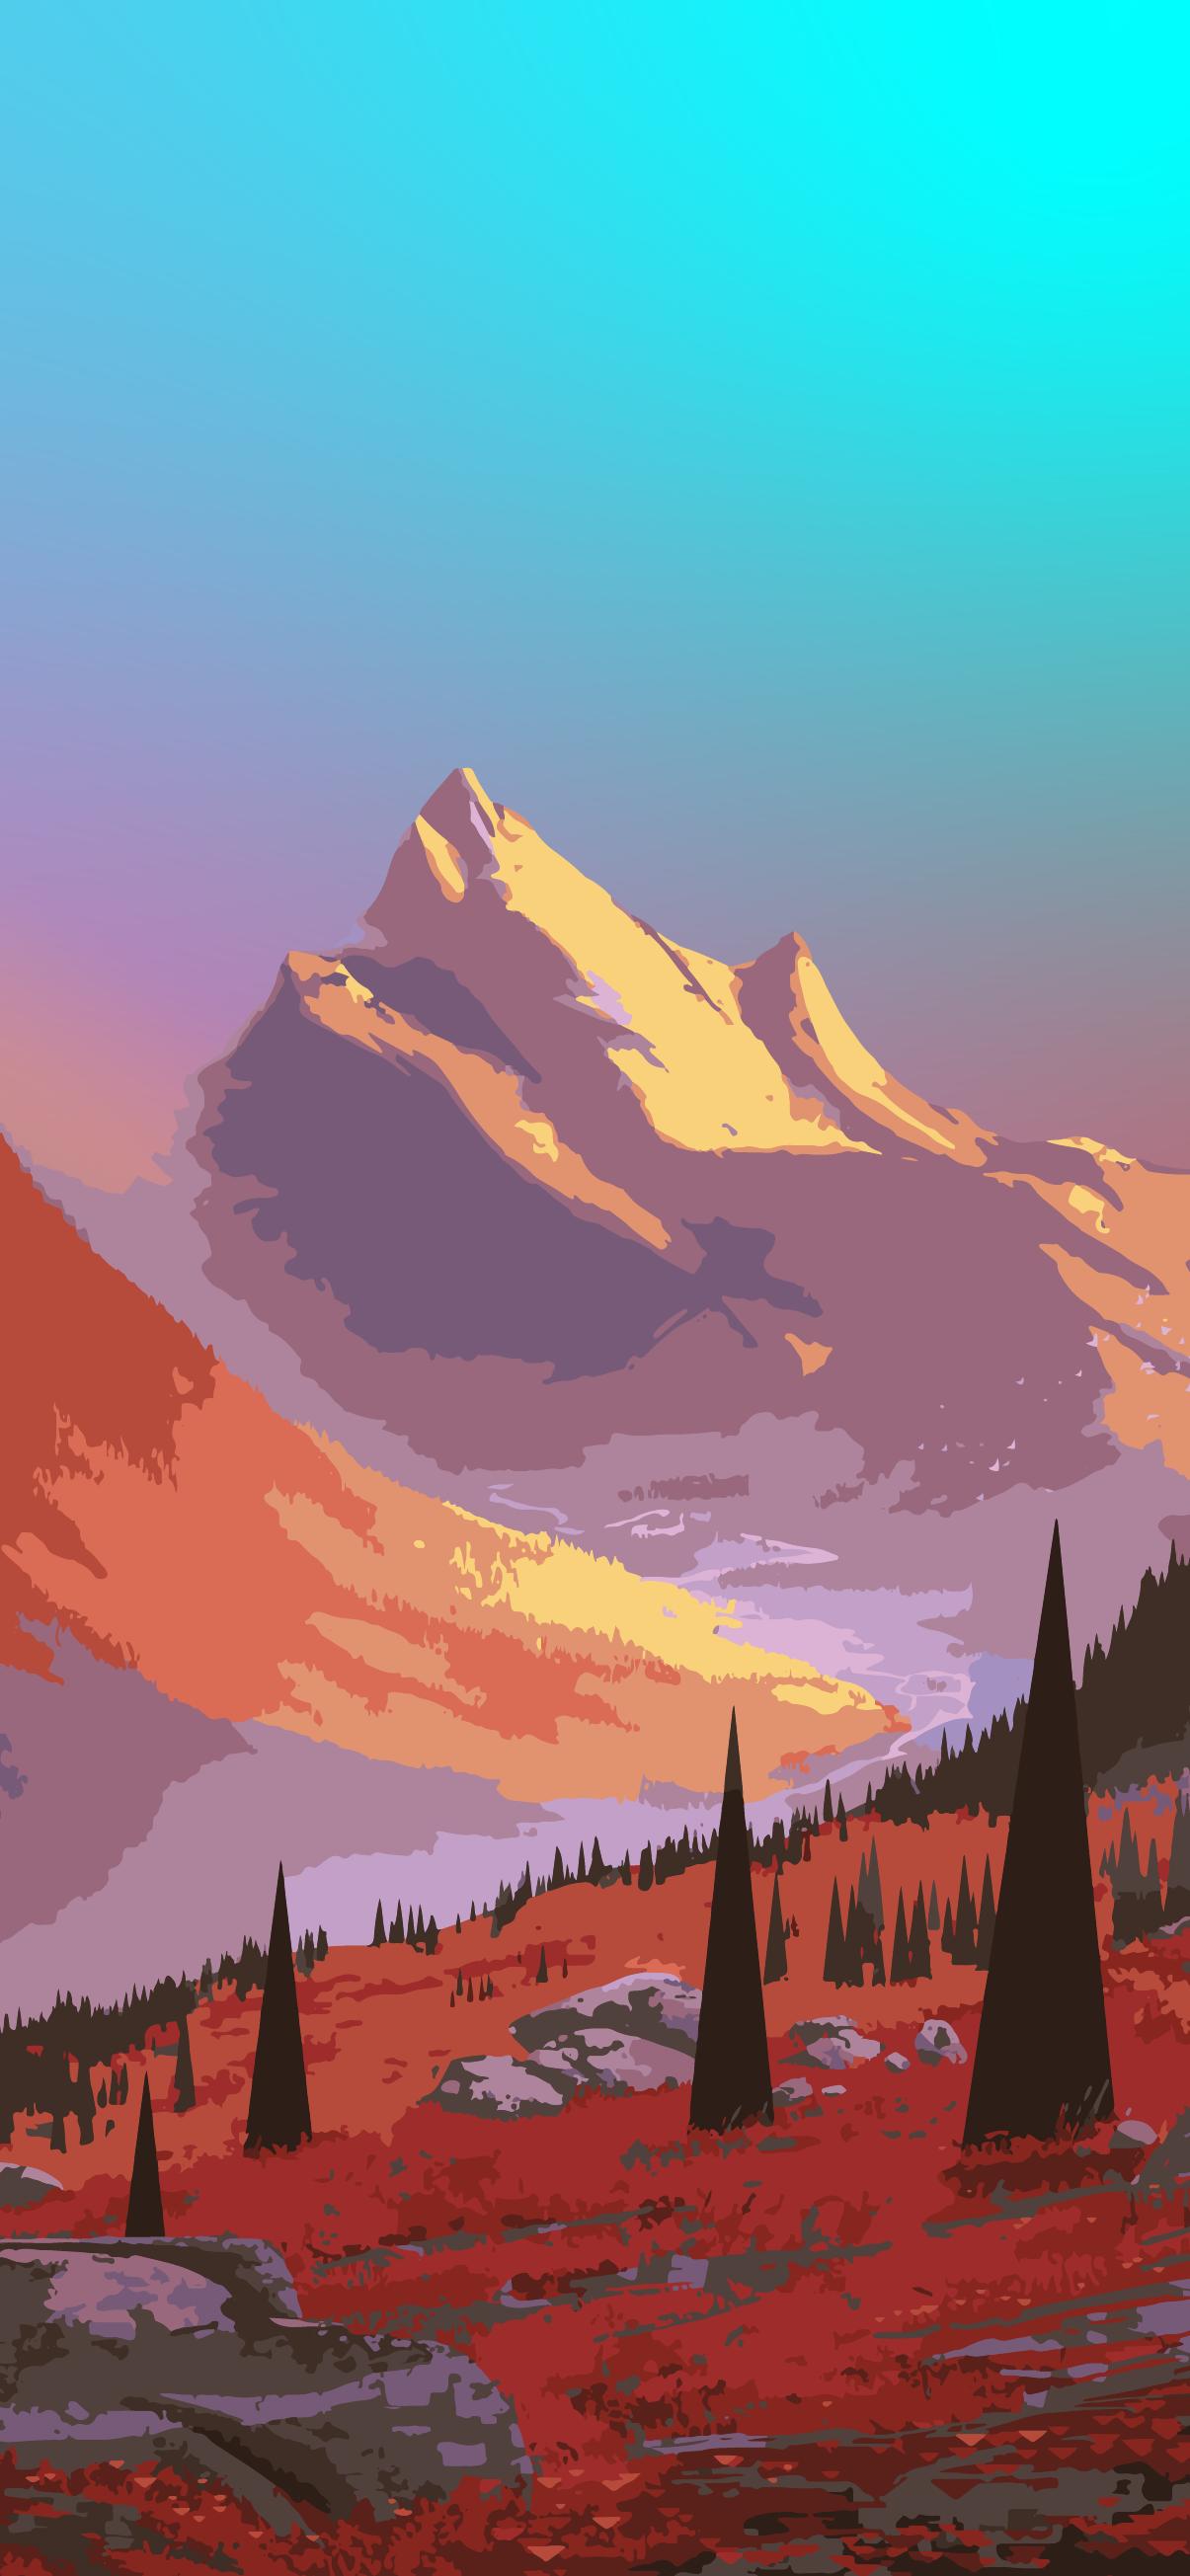 Iphone wallpaper - Beautiful landscape mountain